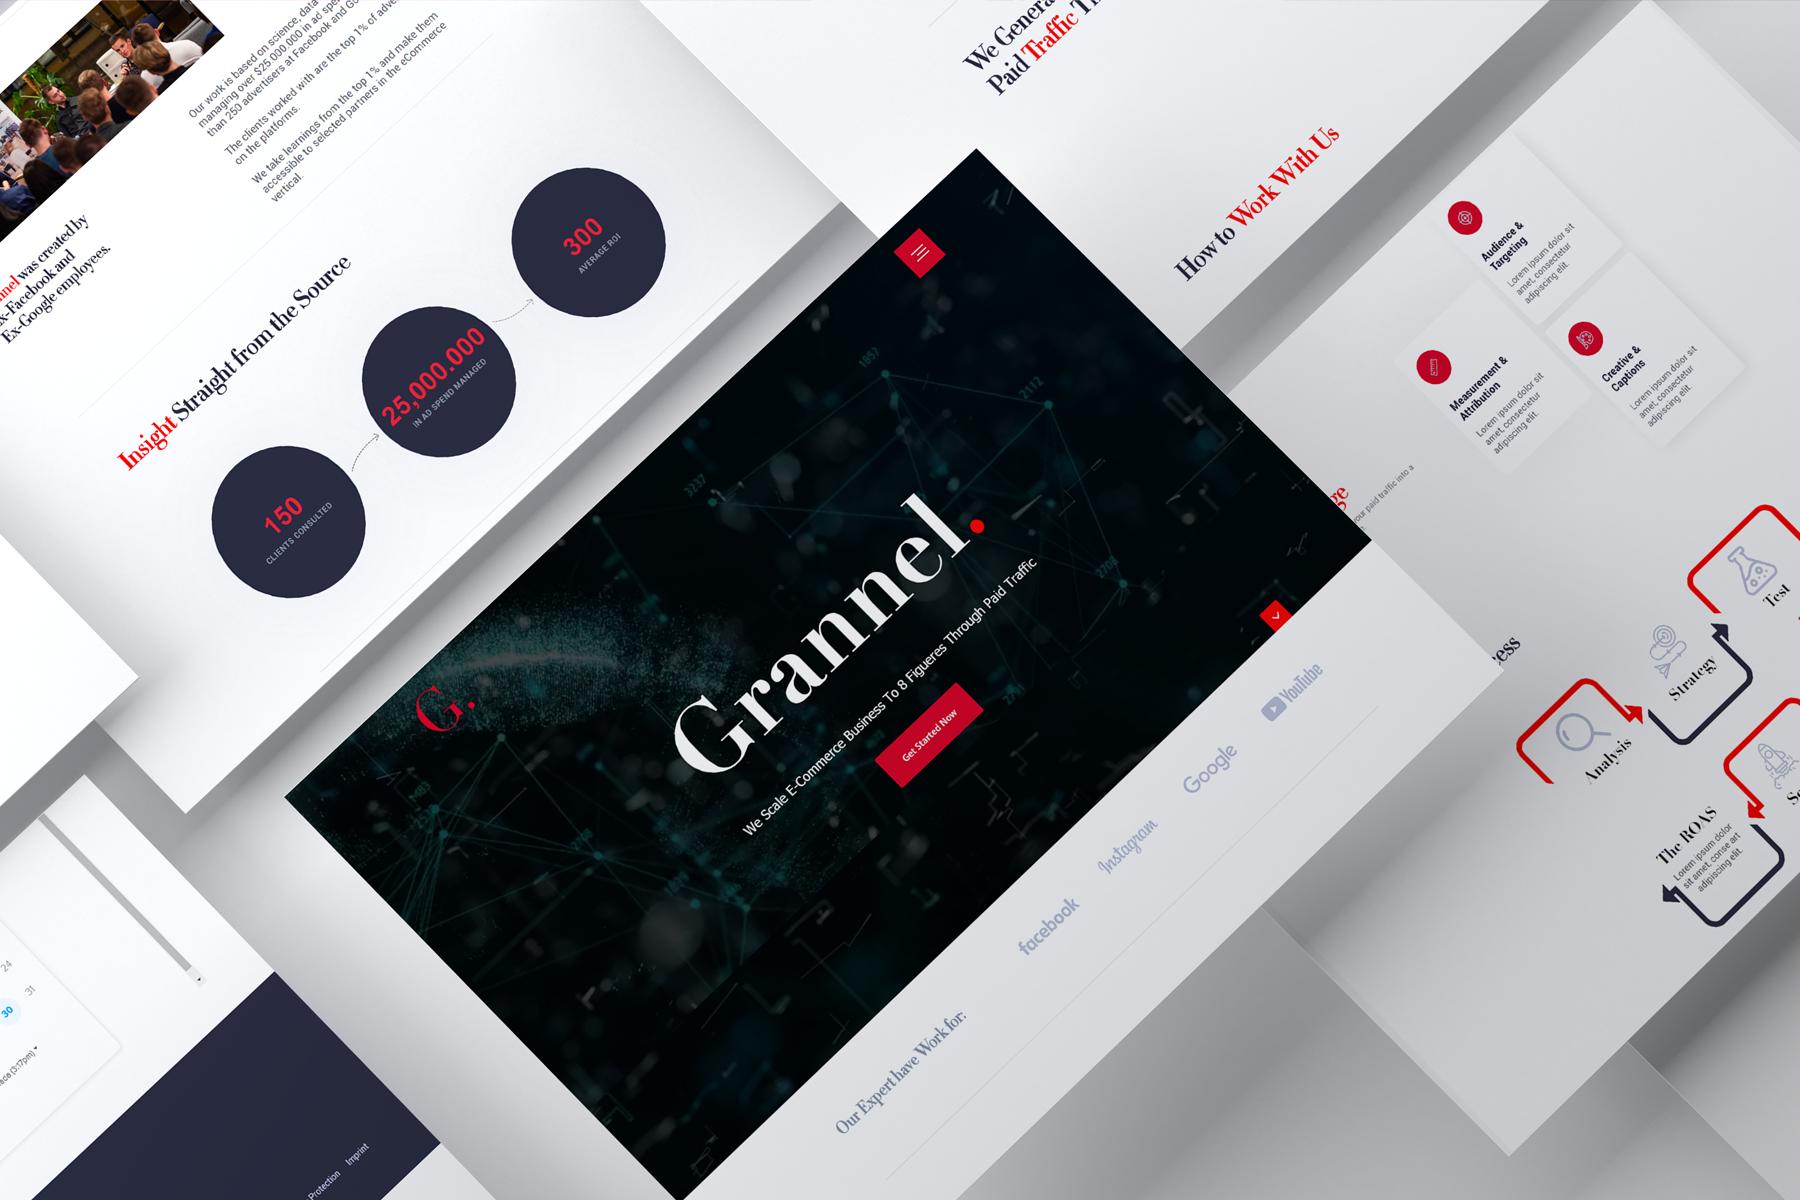 Grannel Webflow design